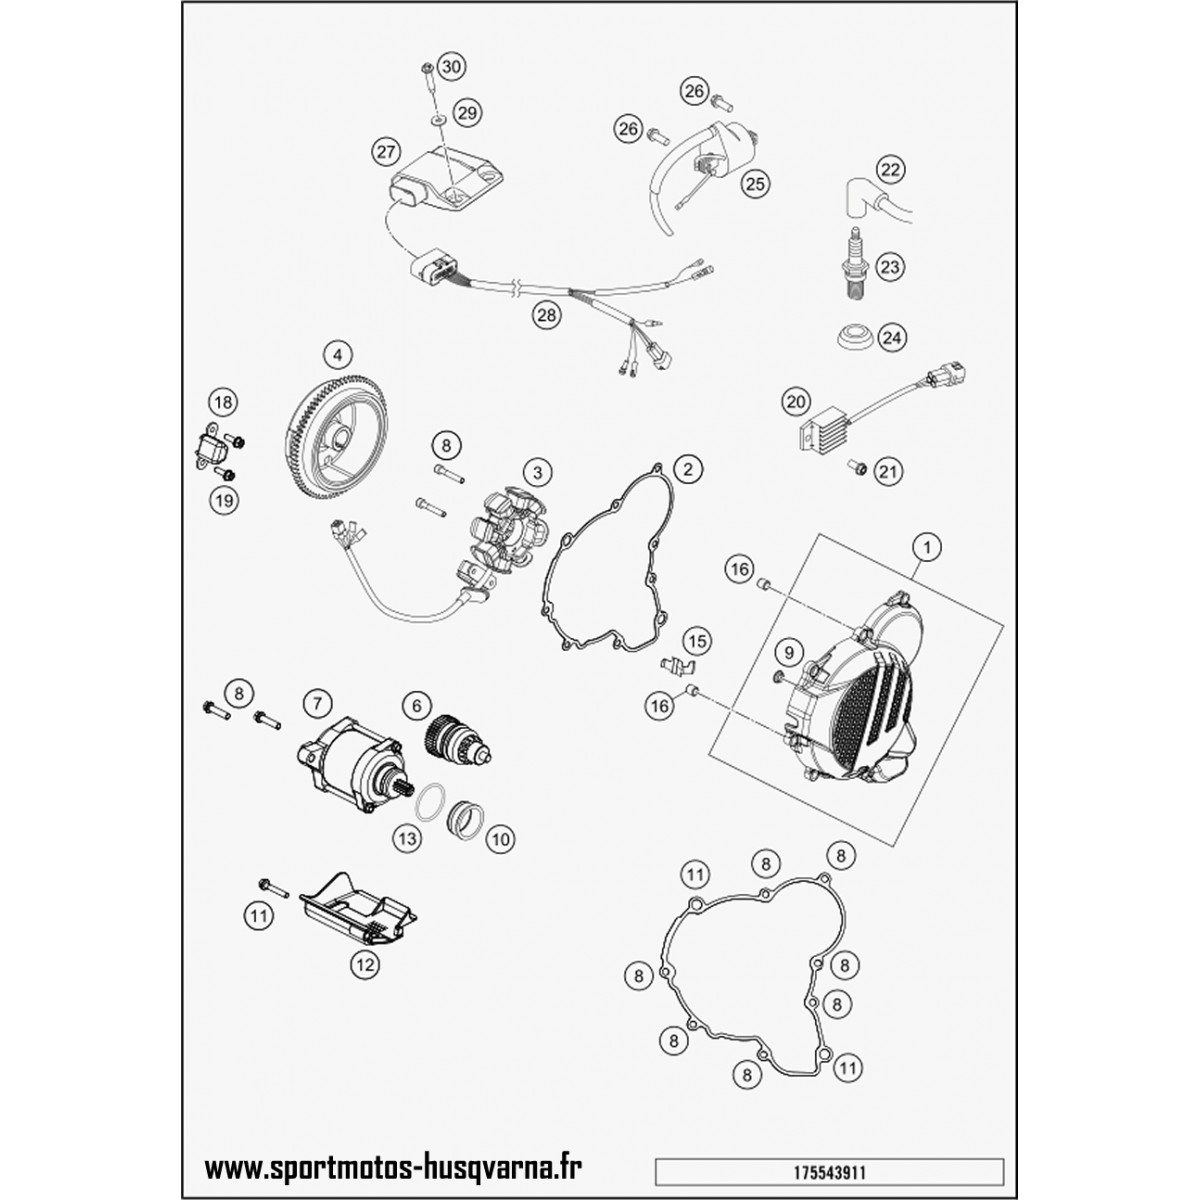 Gn400 wiring diagram wiring diagrams